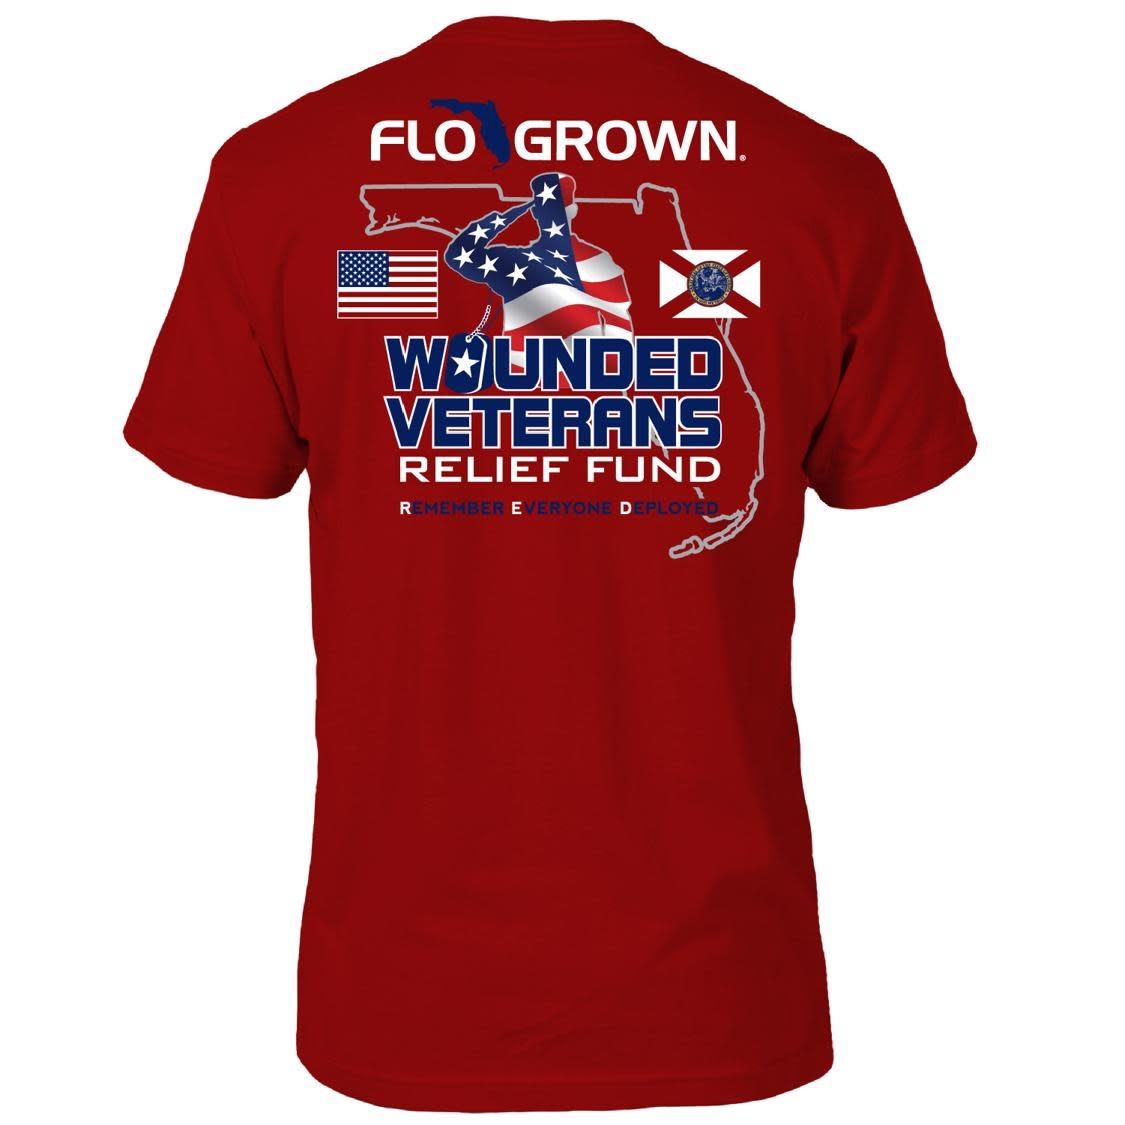 Flo Grown FloGrown RED Friday Tee